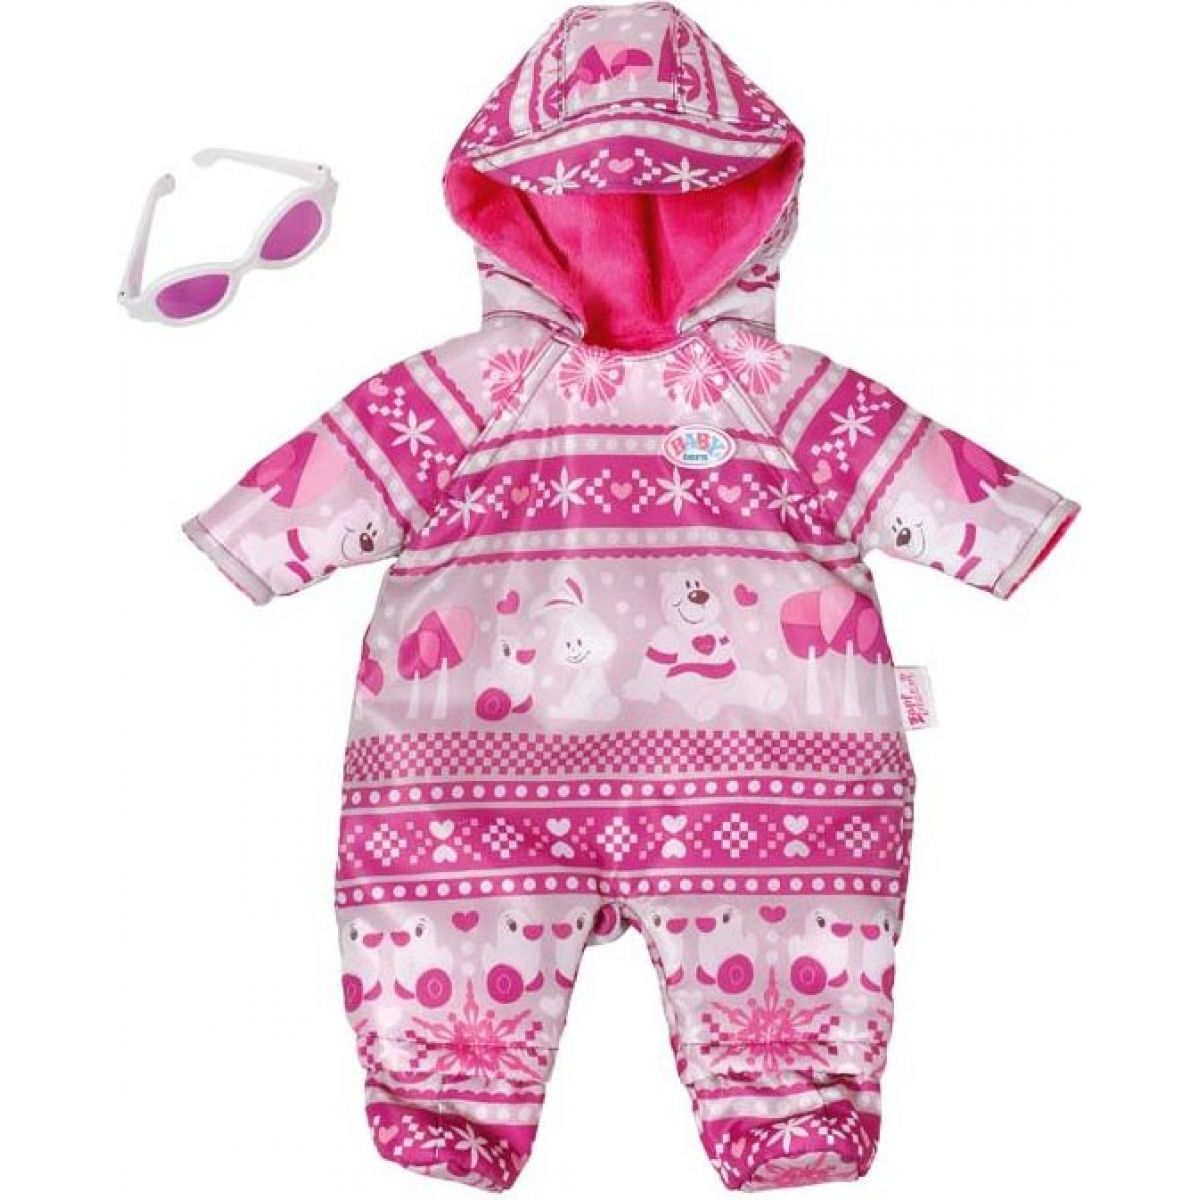 Zapf Creation Baby Born Deluxe zimní souprava